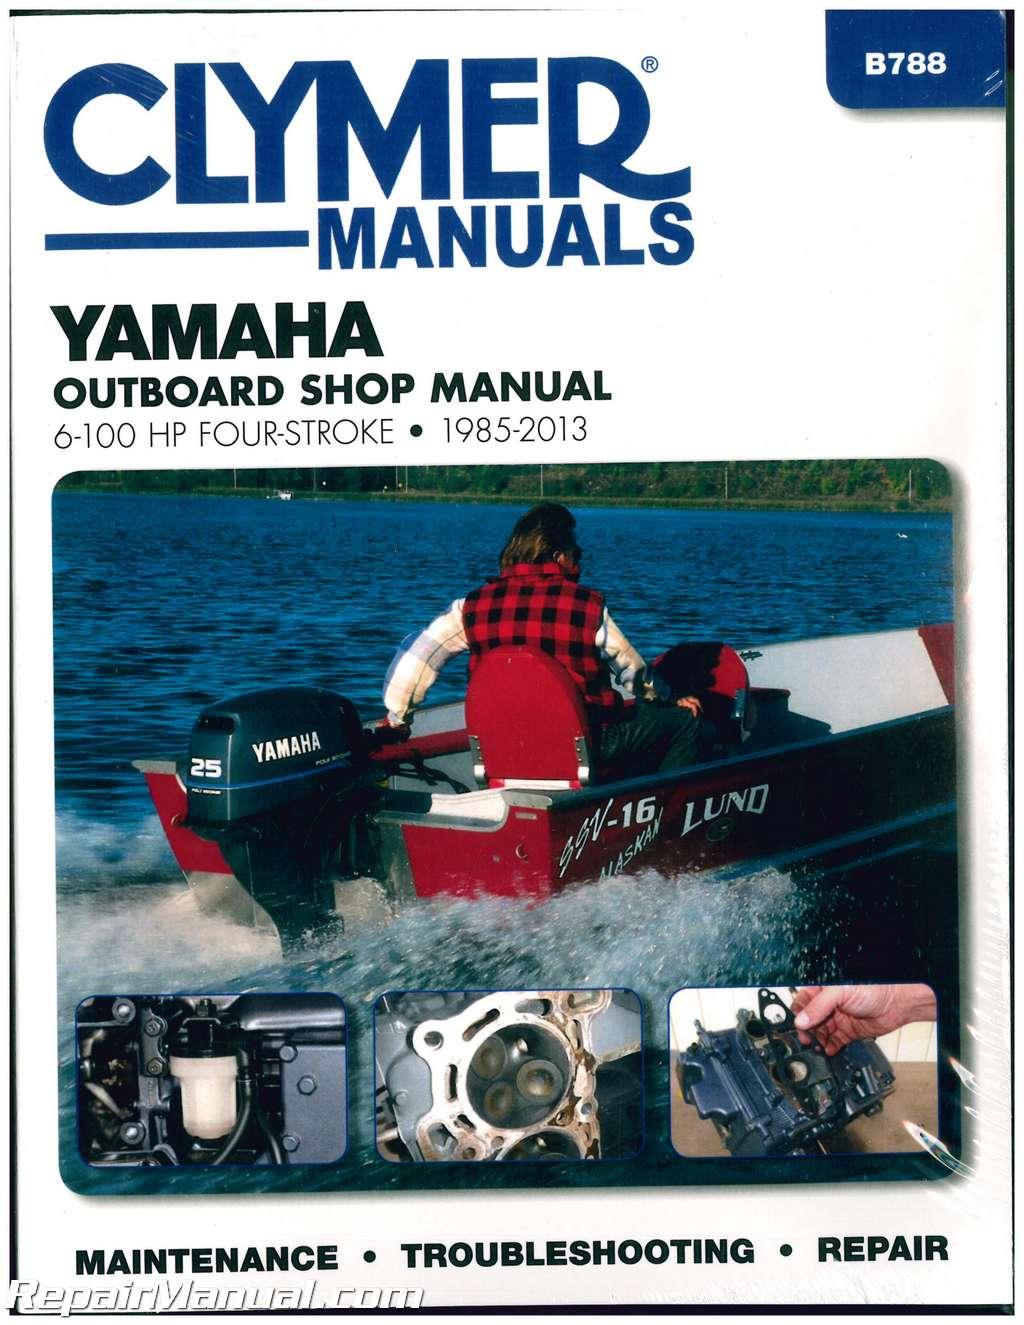 Yamaha Outboard Motor 6 100hp Repair Manual 1985 2013 Clymer